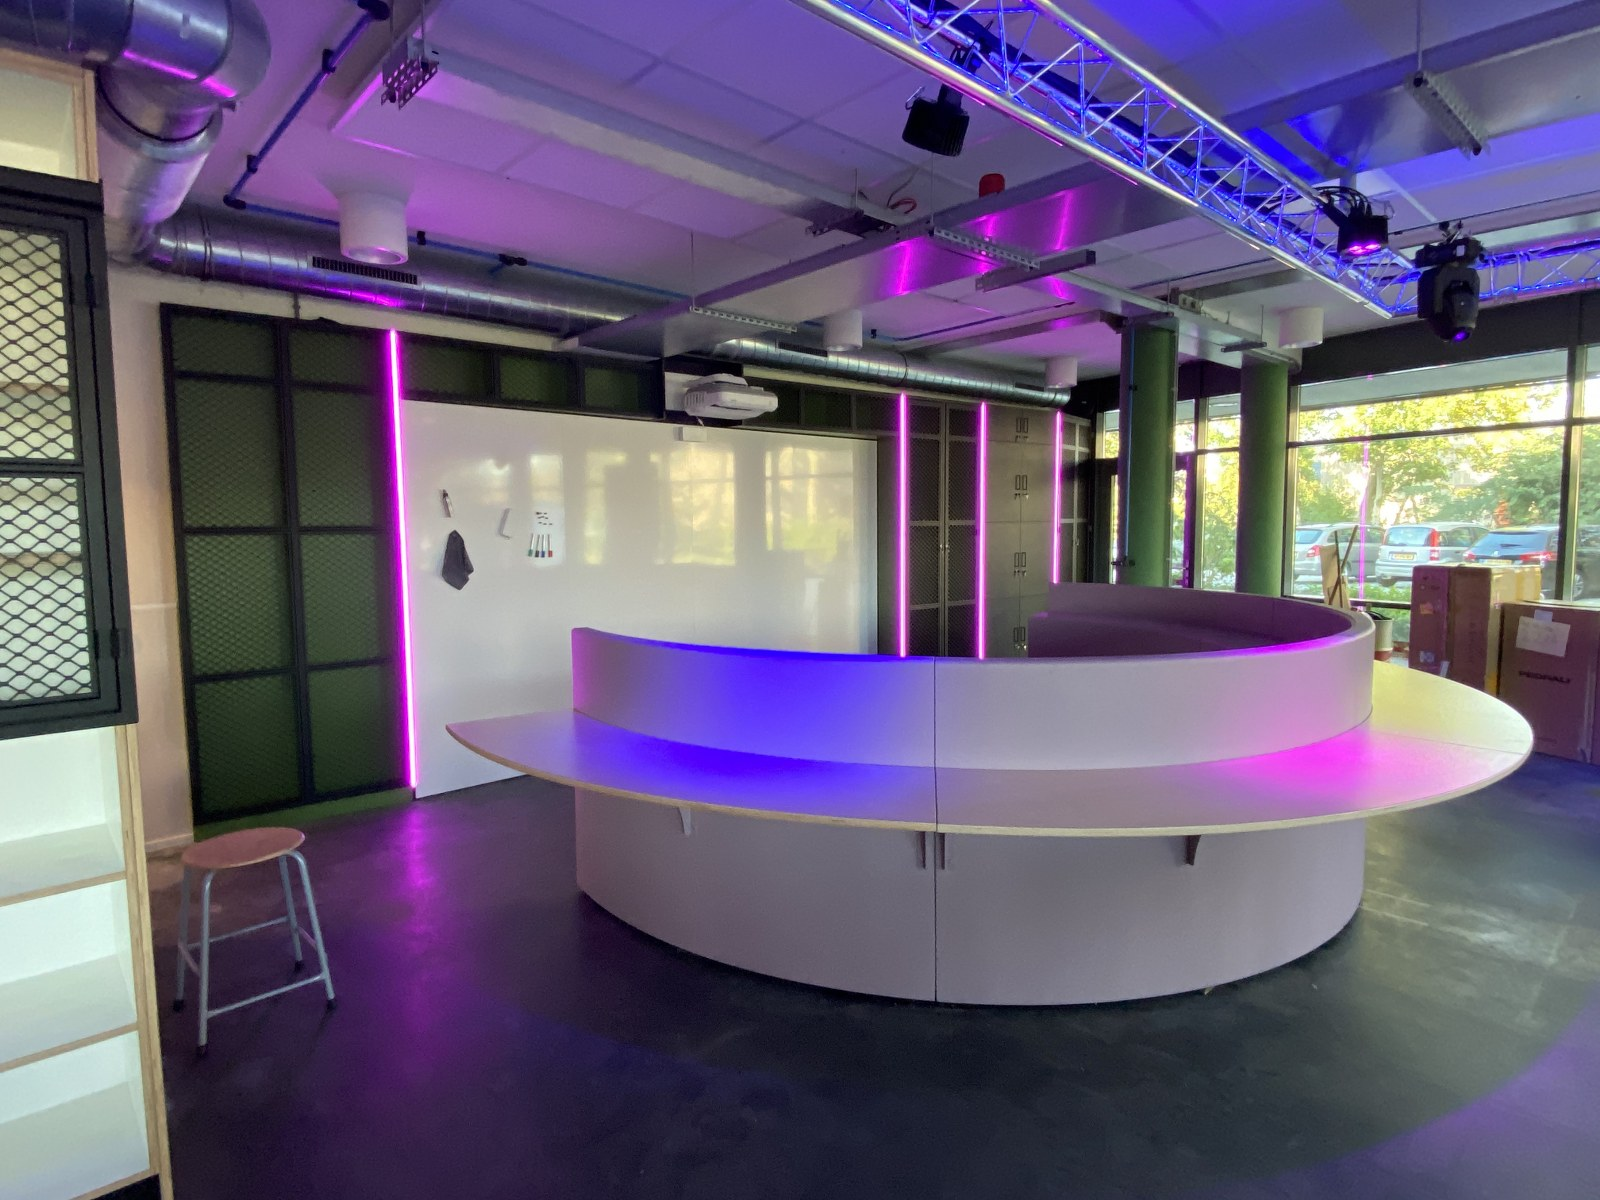 Experience lab Piter Jelles Ynsicht